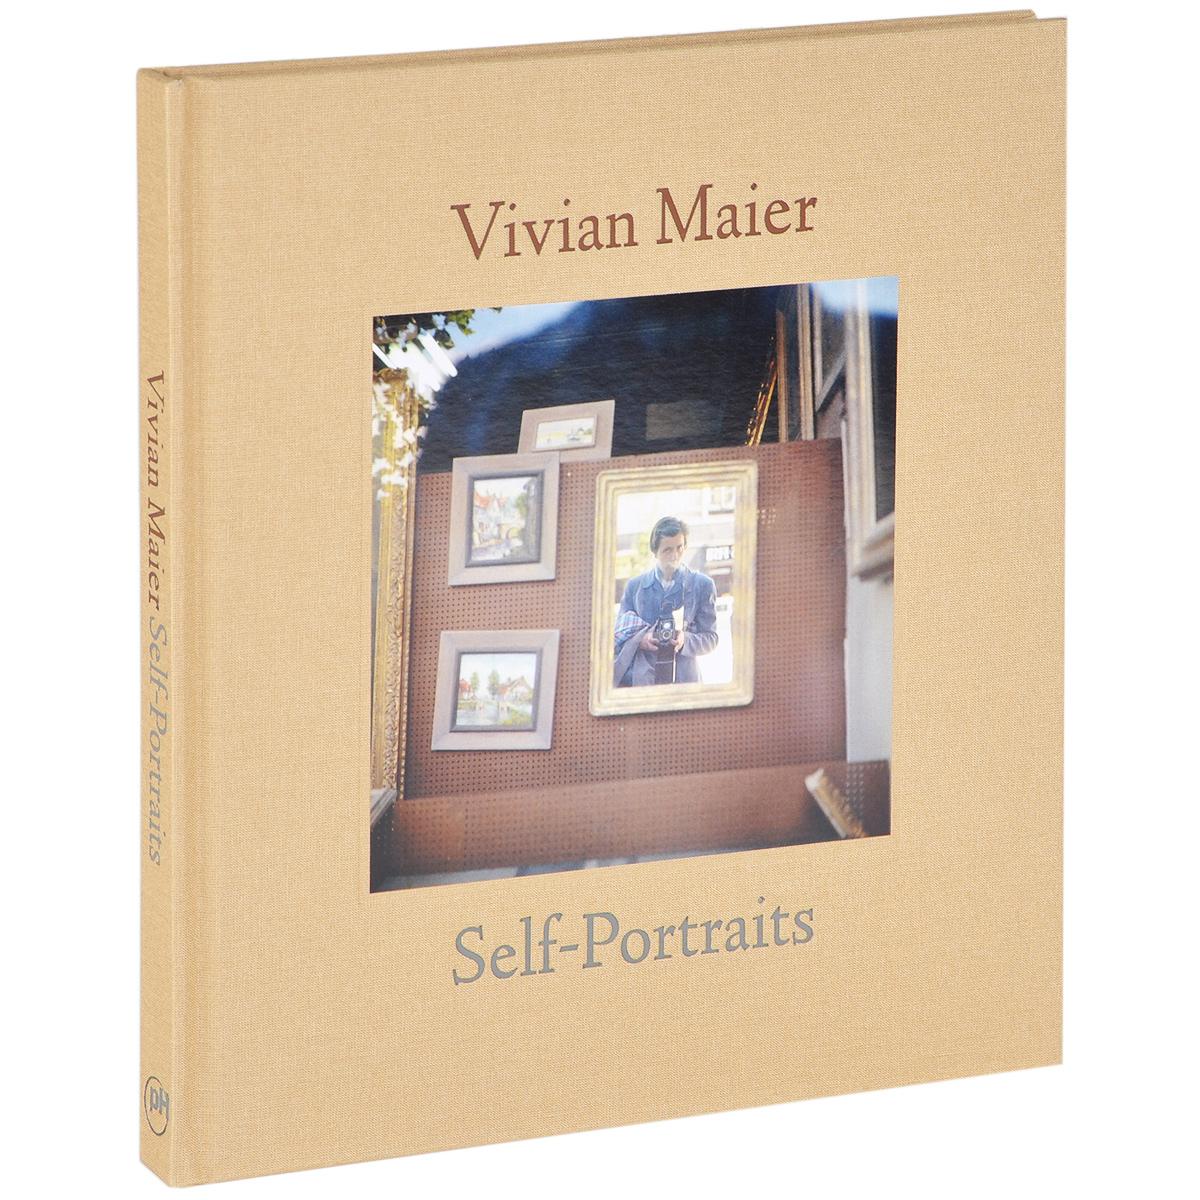 Vivian Maier: Self-Portraits lisette